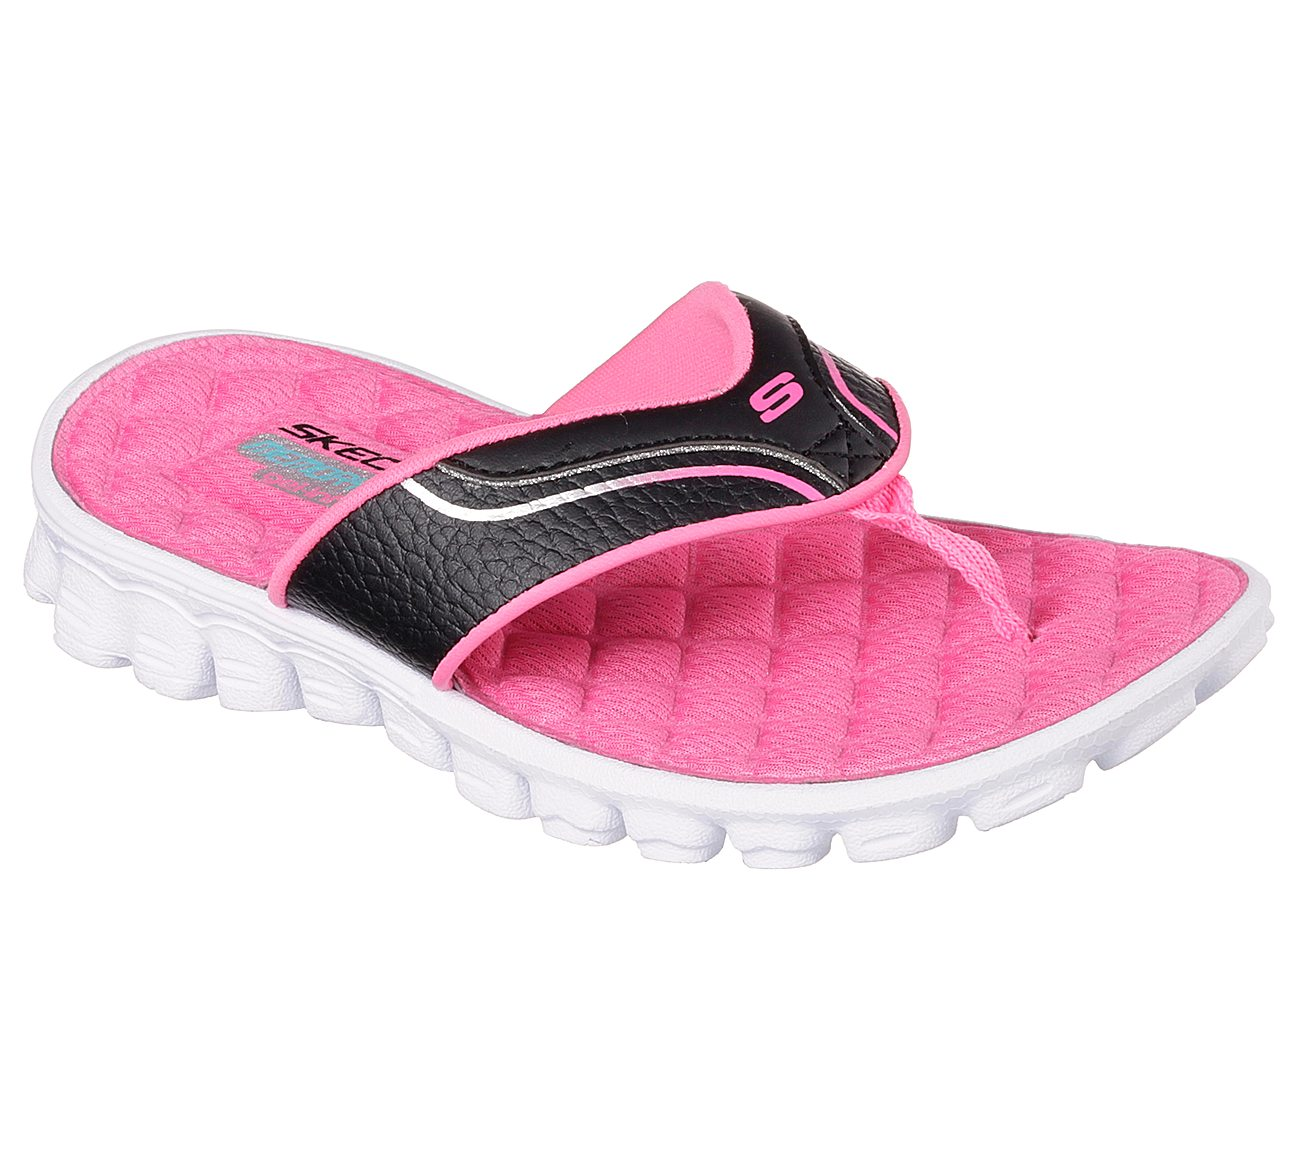 fc1a52c1899328 Buy SKECHERS Skech Flex - Summer Solstice Shoes only  32.00